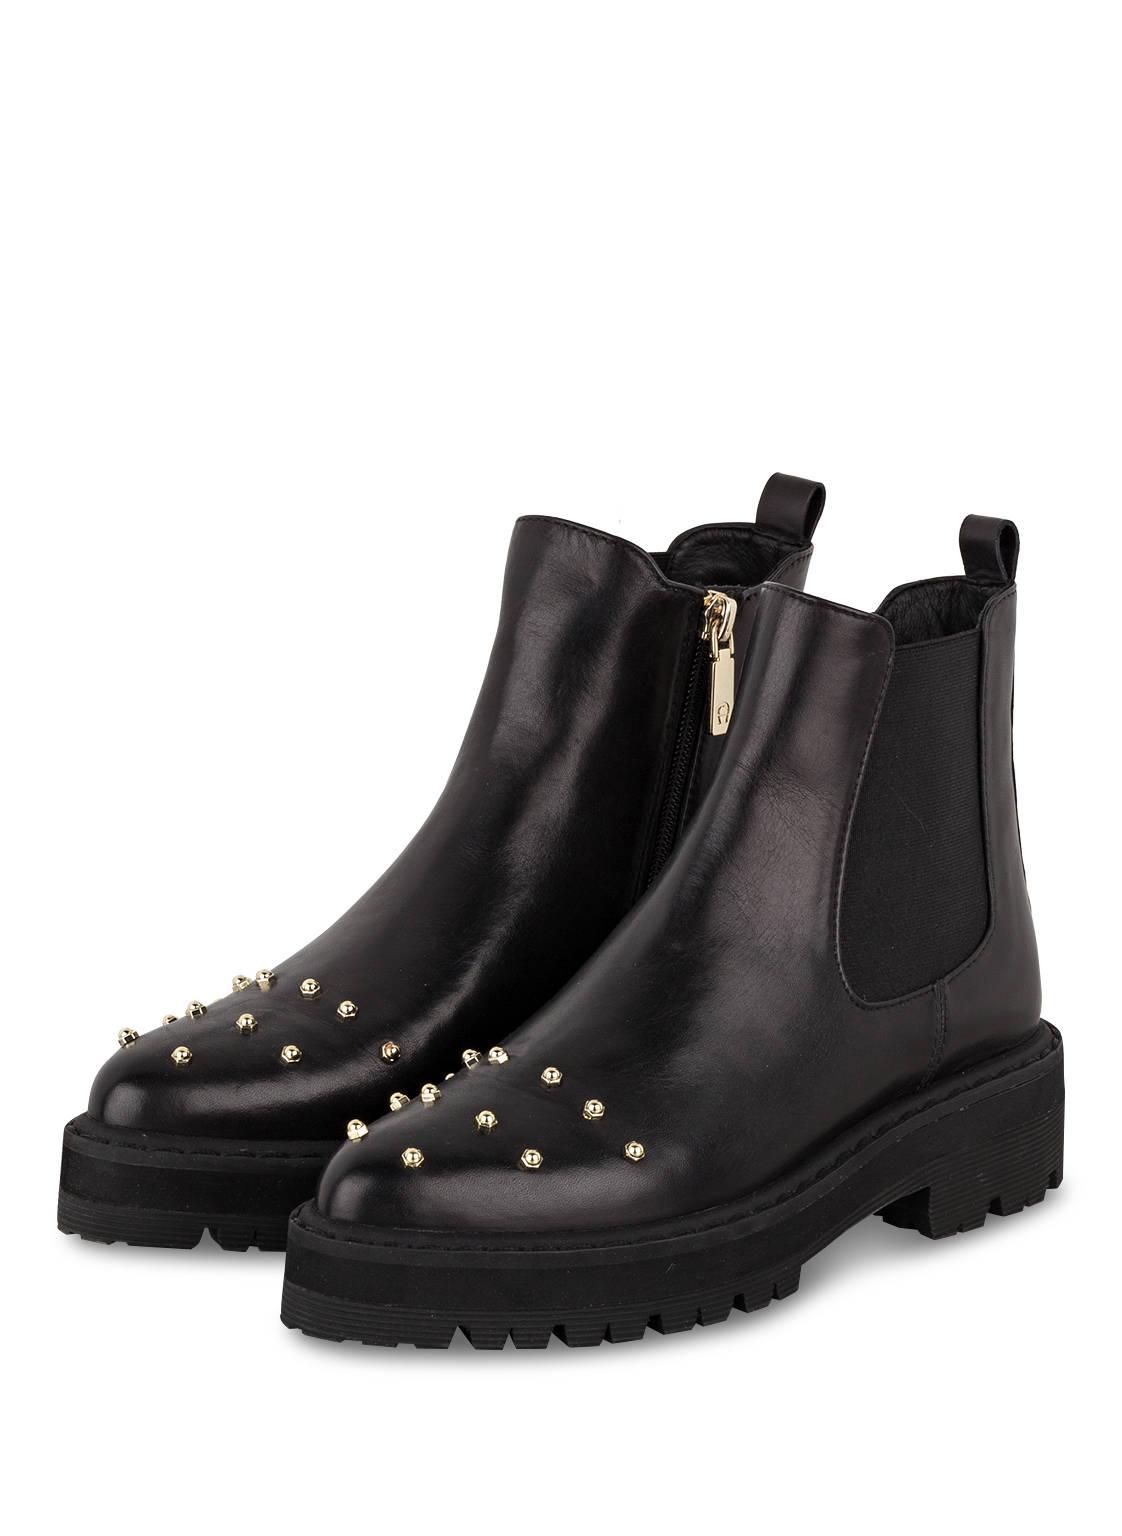 Image of Aigner Chelsea-Boots Amanda schwarz